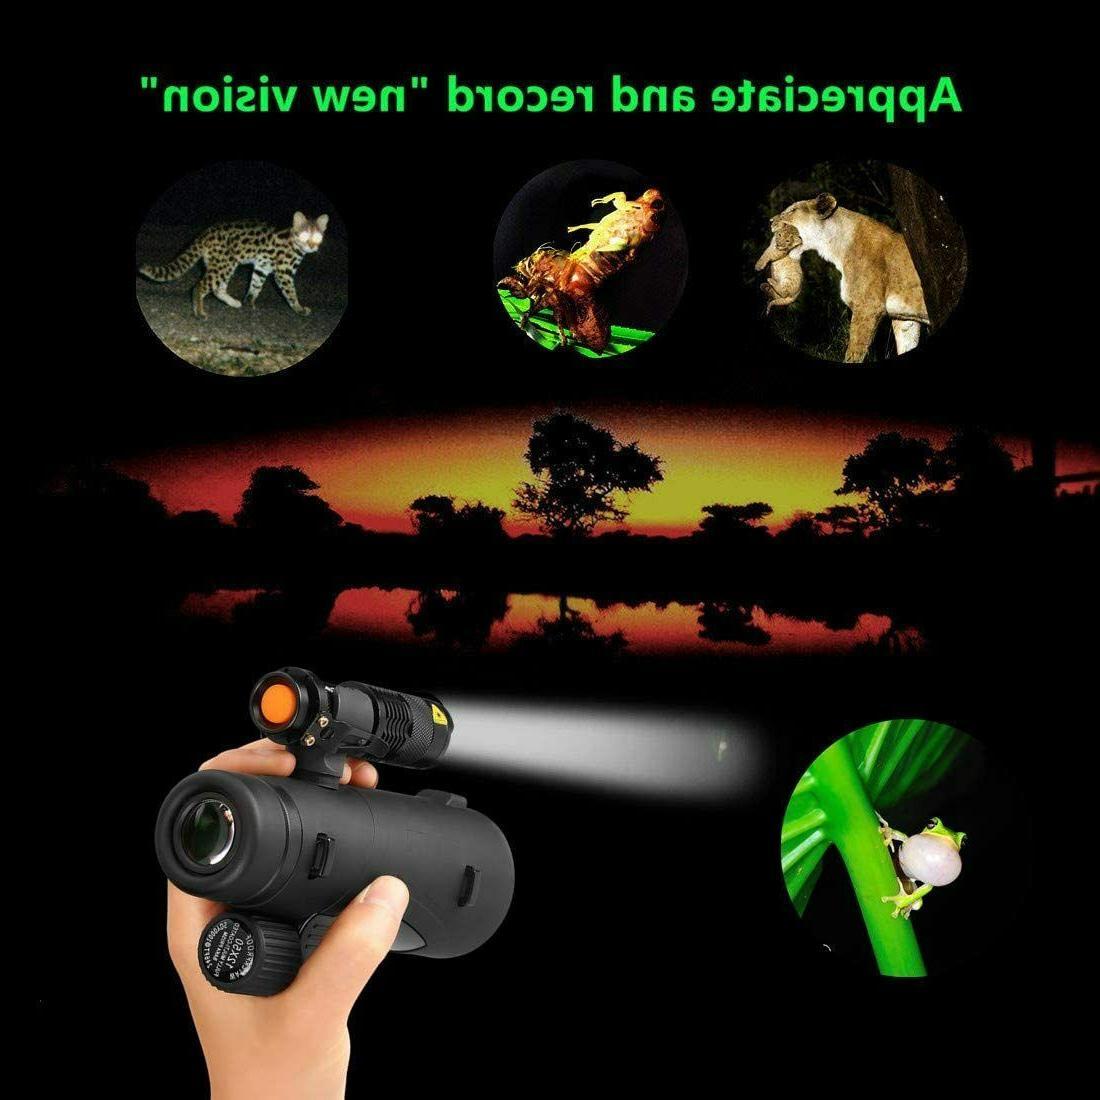 HD Starscope Camera Zoom Lense+Tripod Phone Mount